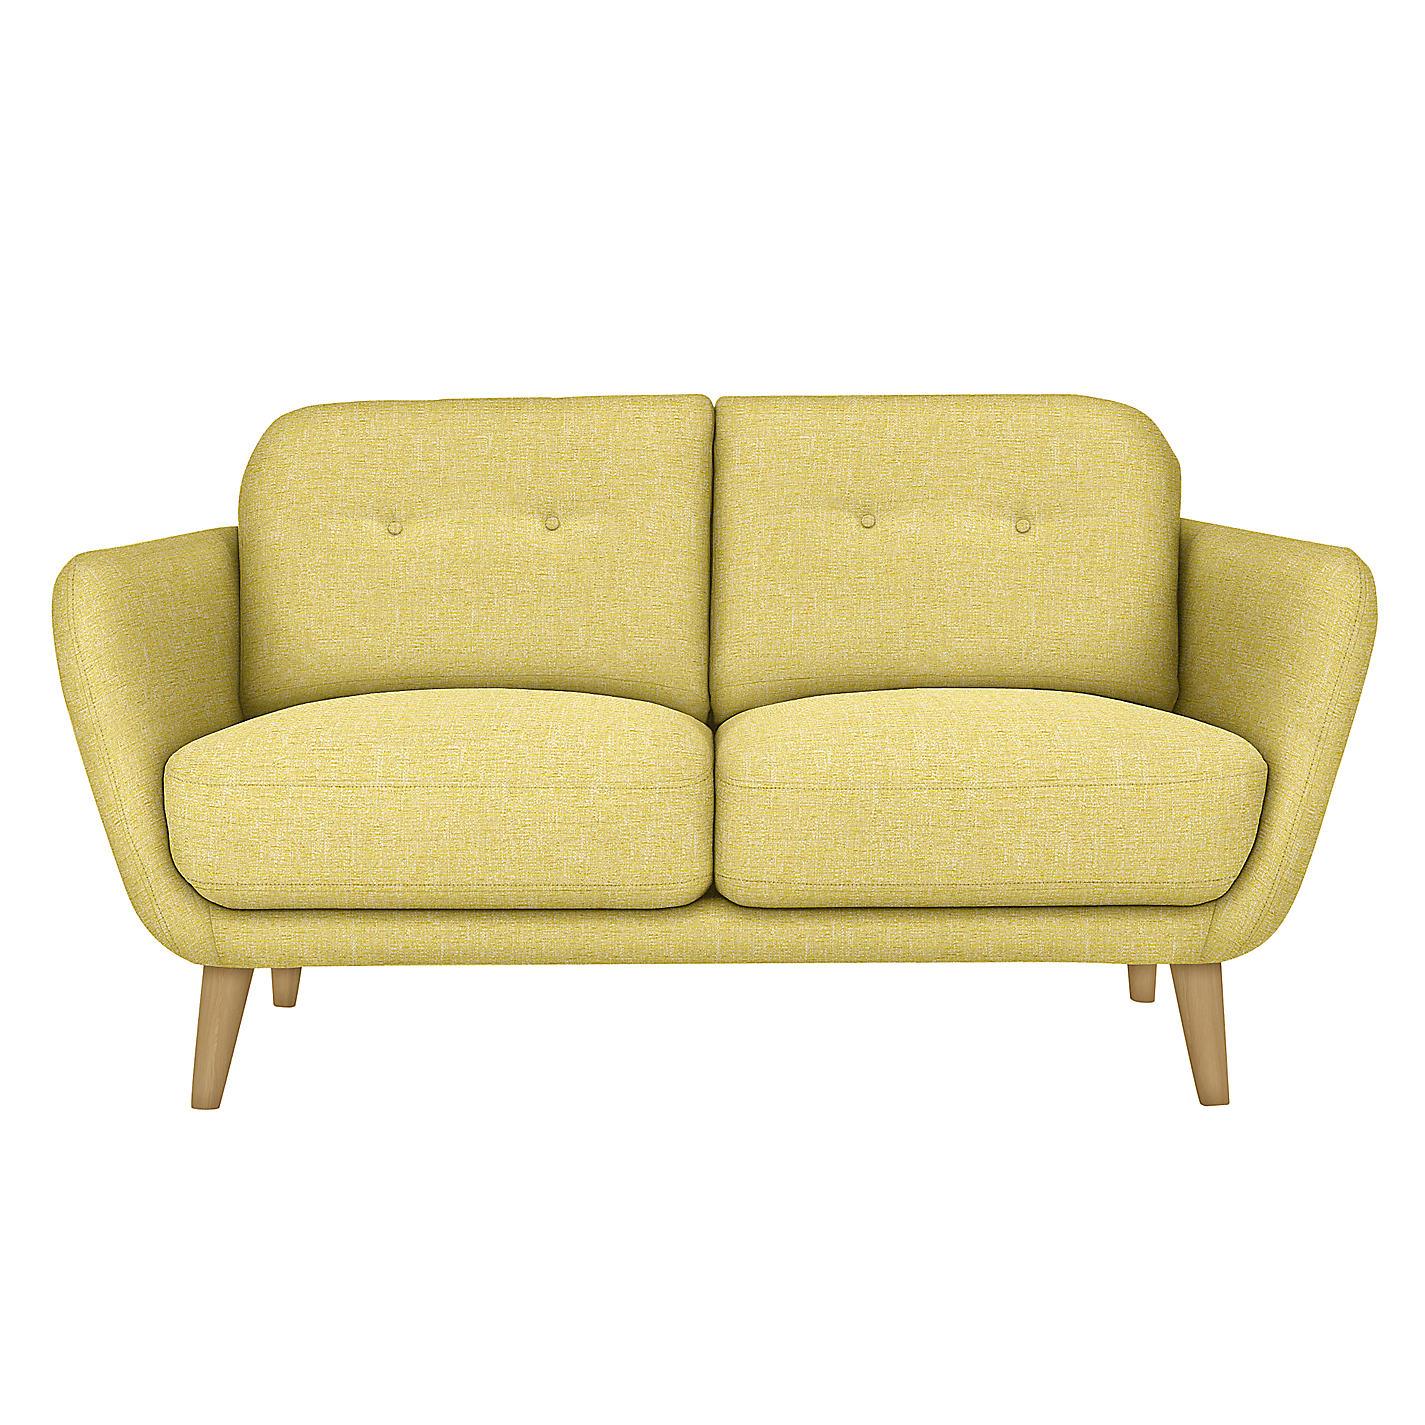 2 seater corner sofa new corner sofa large 6 seater 4 2 l for Sofa 6 seater